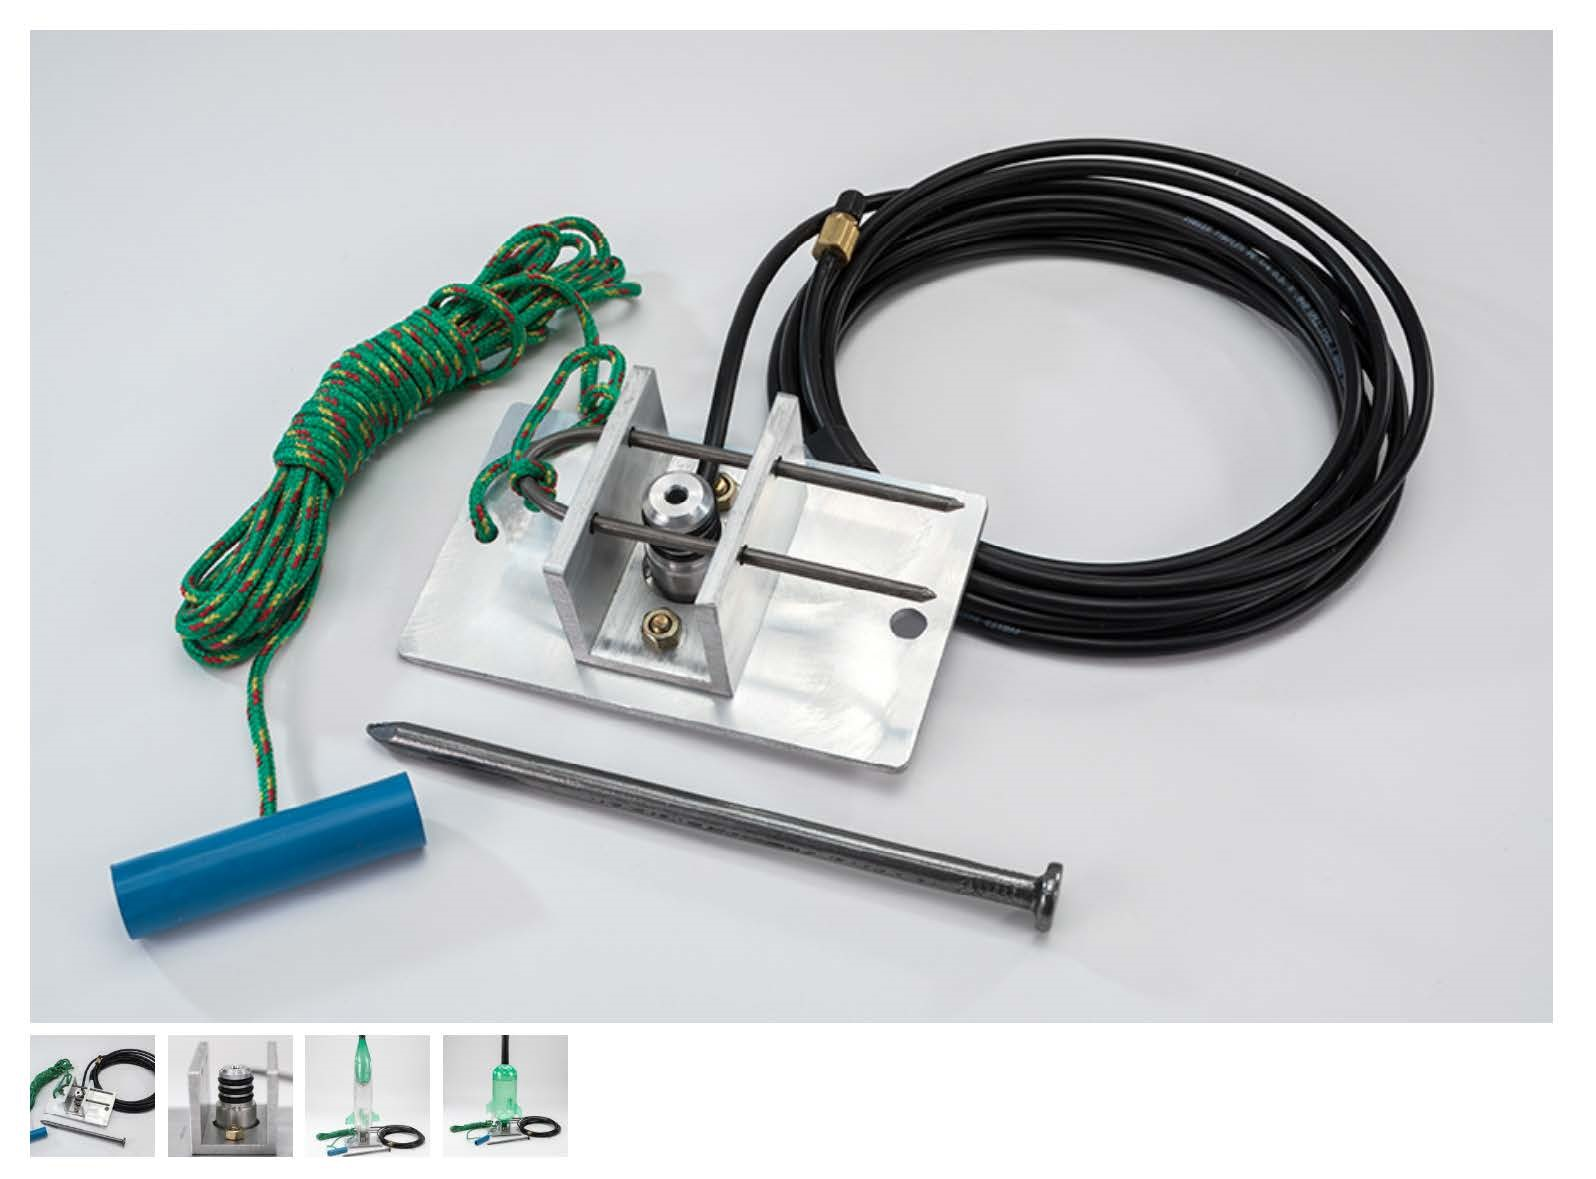 Figure 2: NERDS Inc Launcher